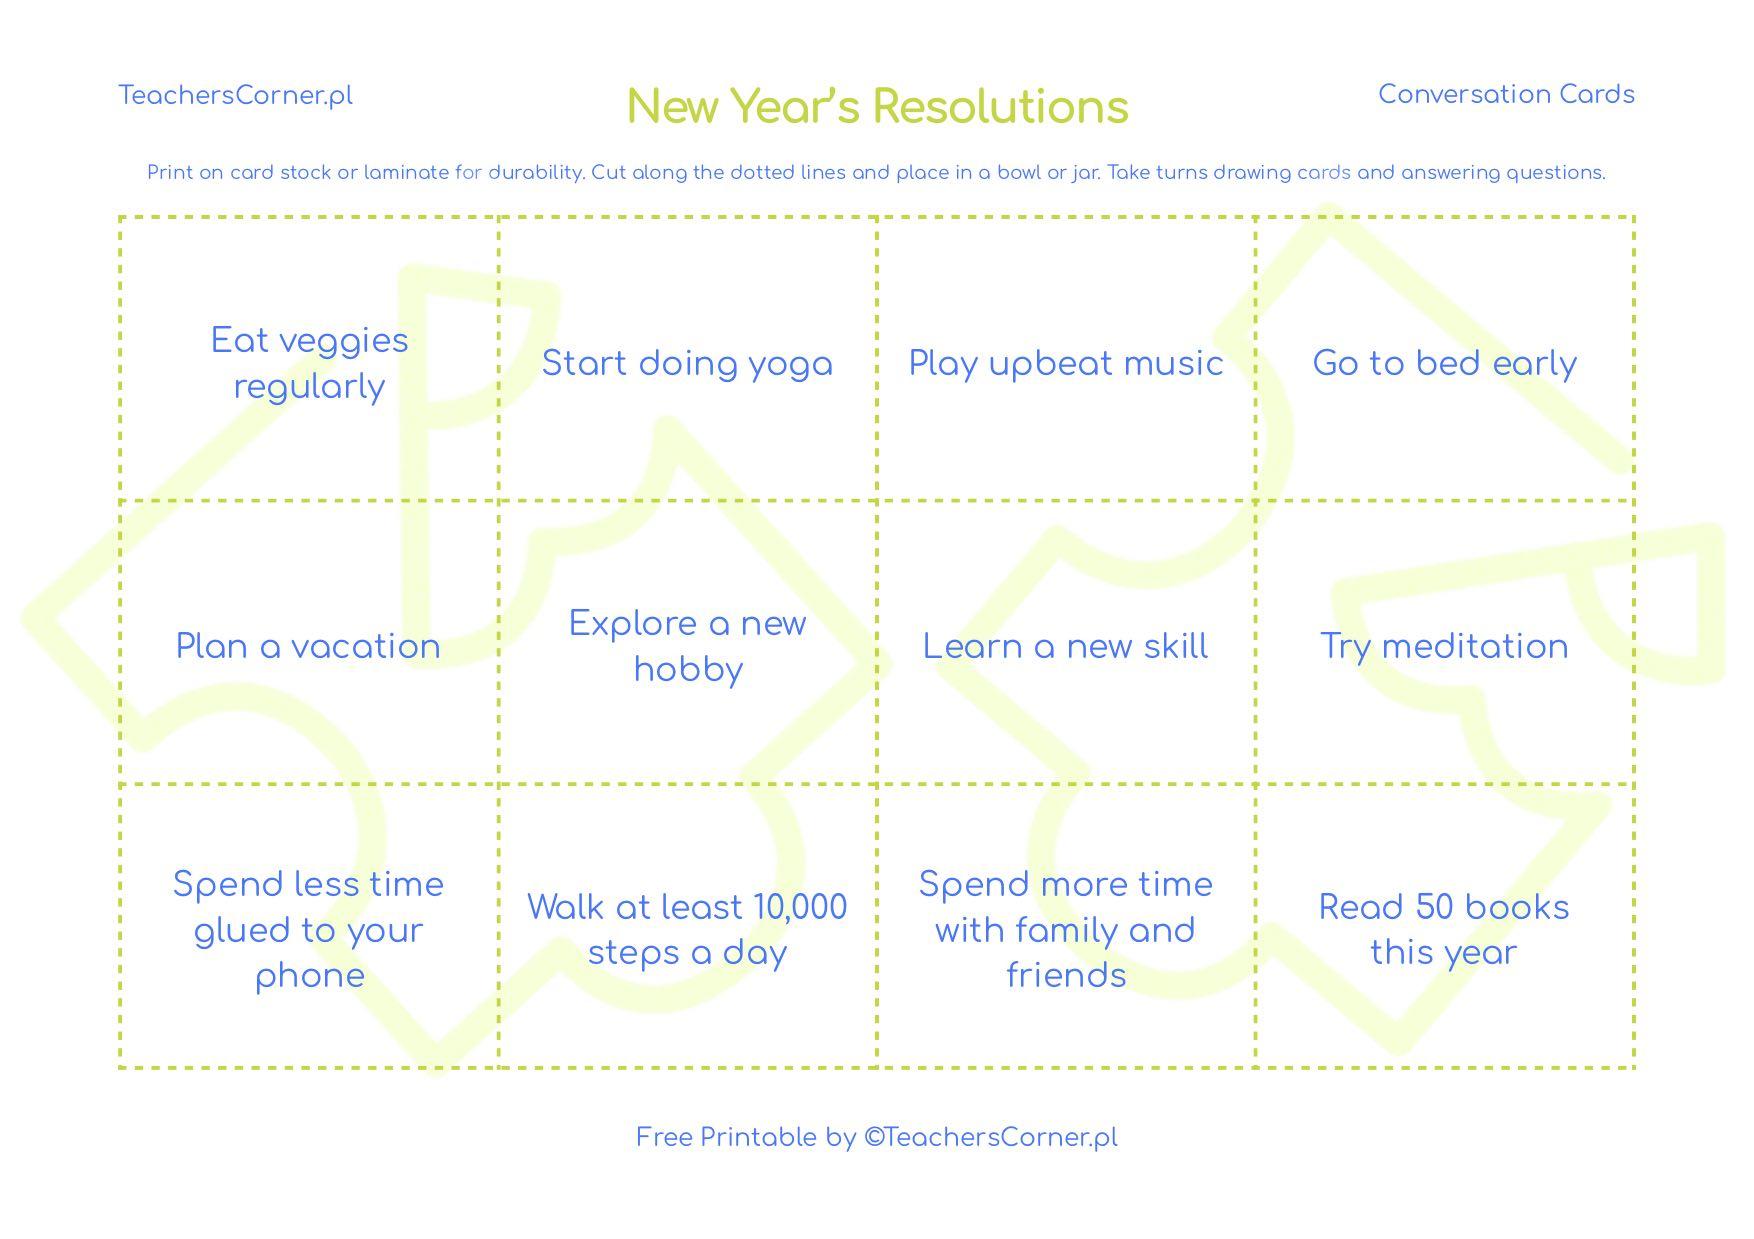 New year's resolutions karty konwersacyjne